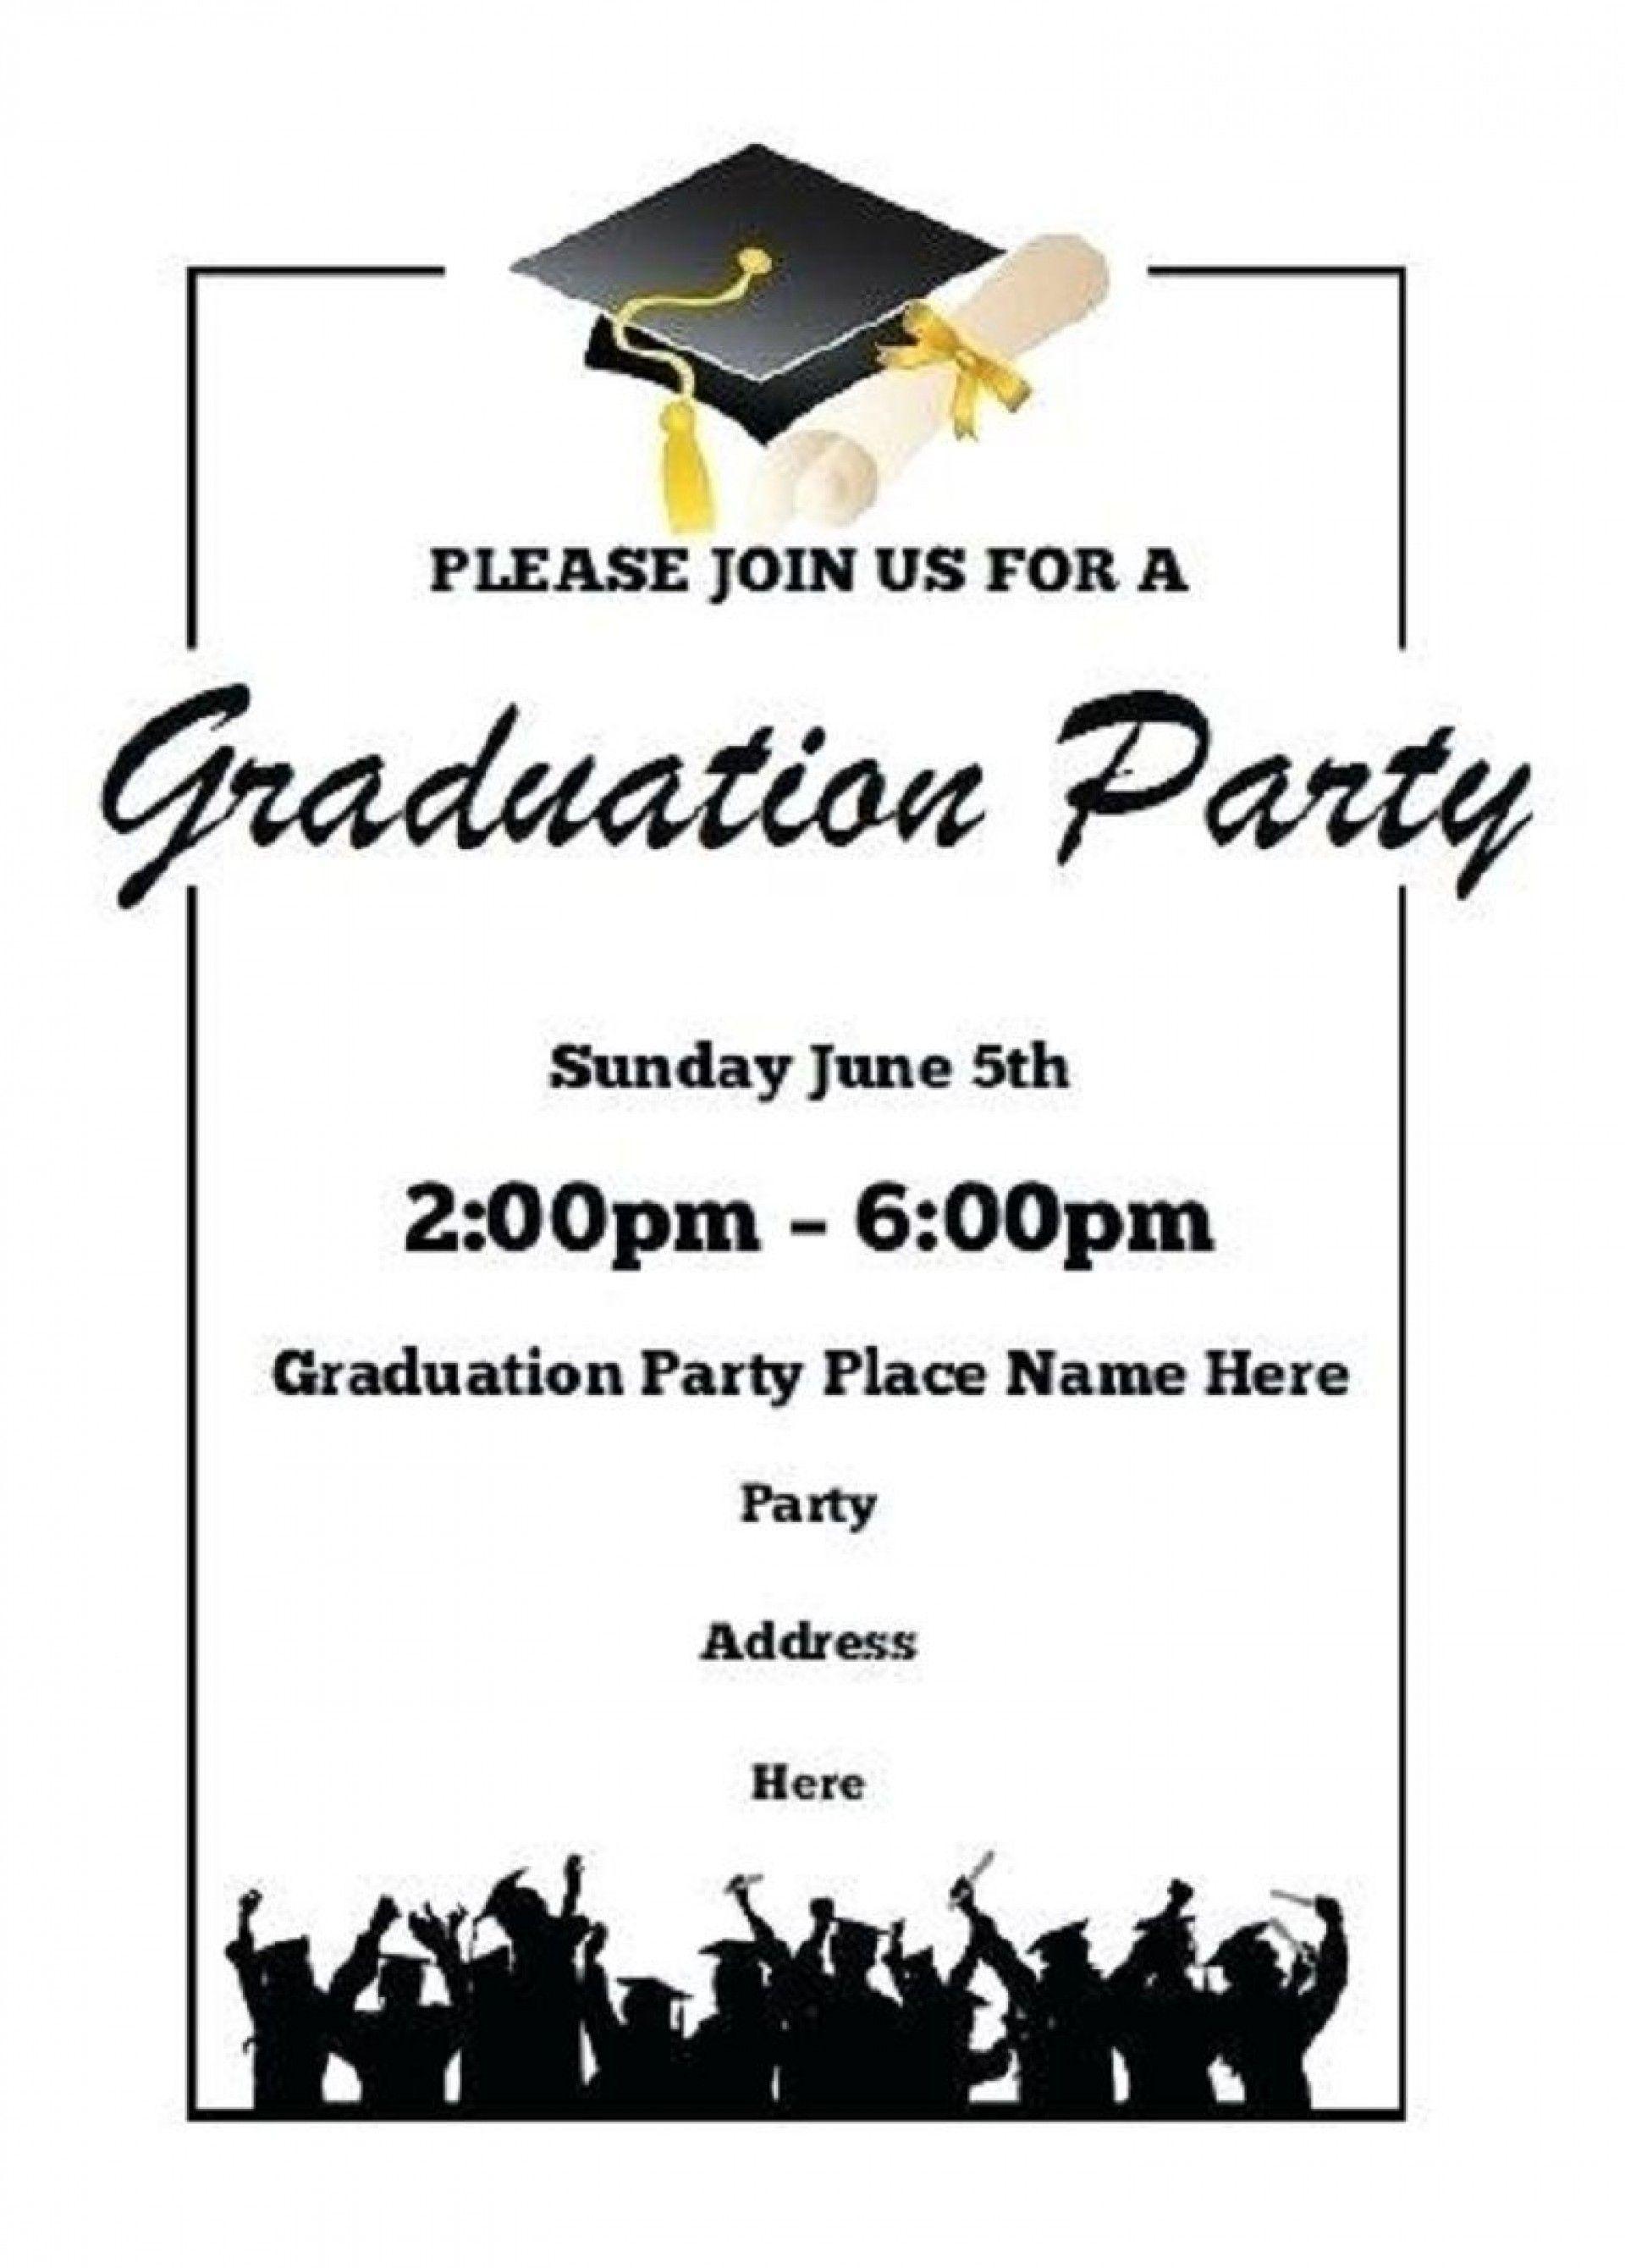 002 Wondrou Graduation Party Invitation Template Sample  Templates 4 Per Page Free ReceptionFull